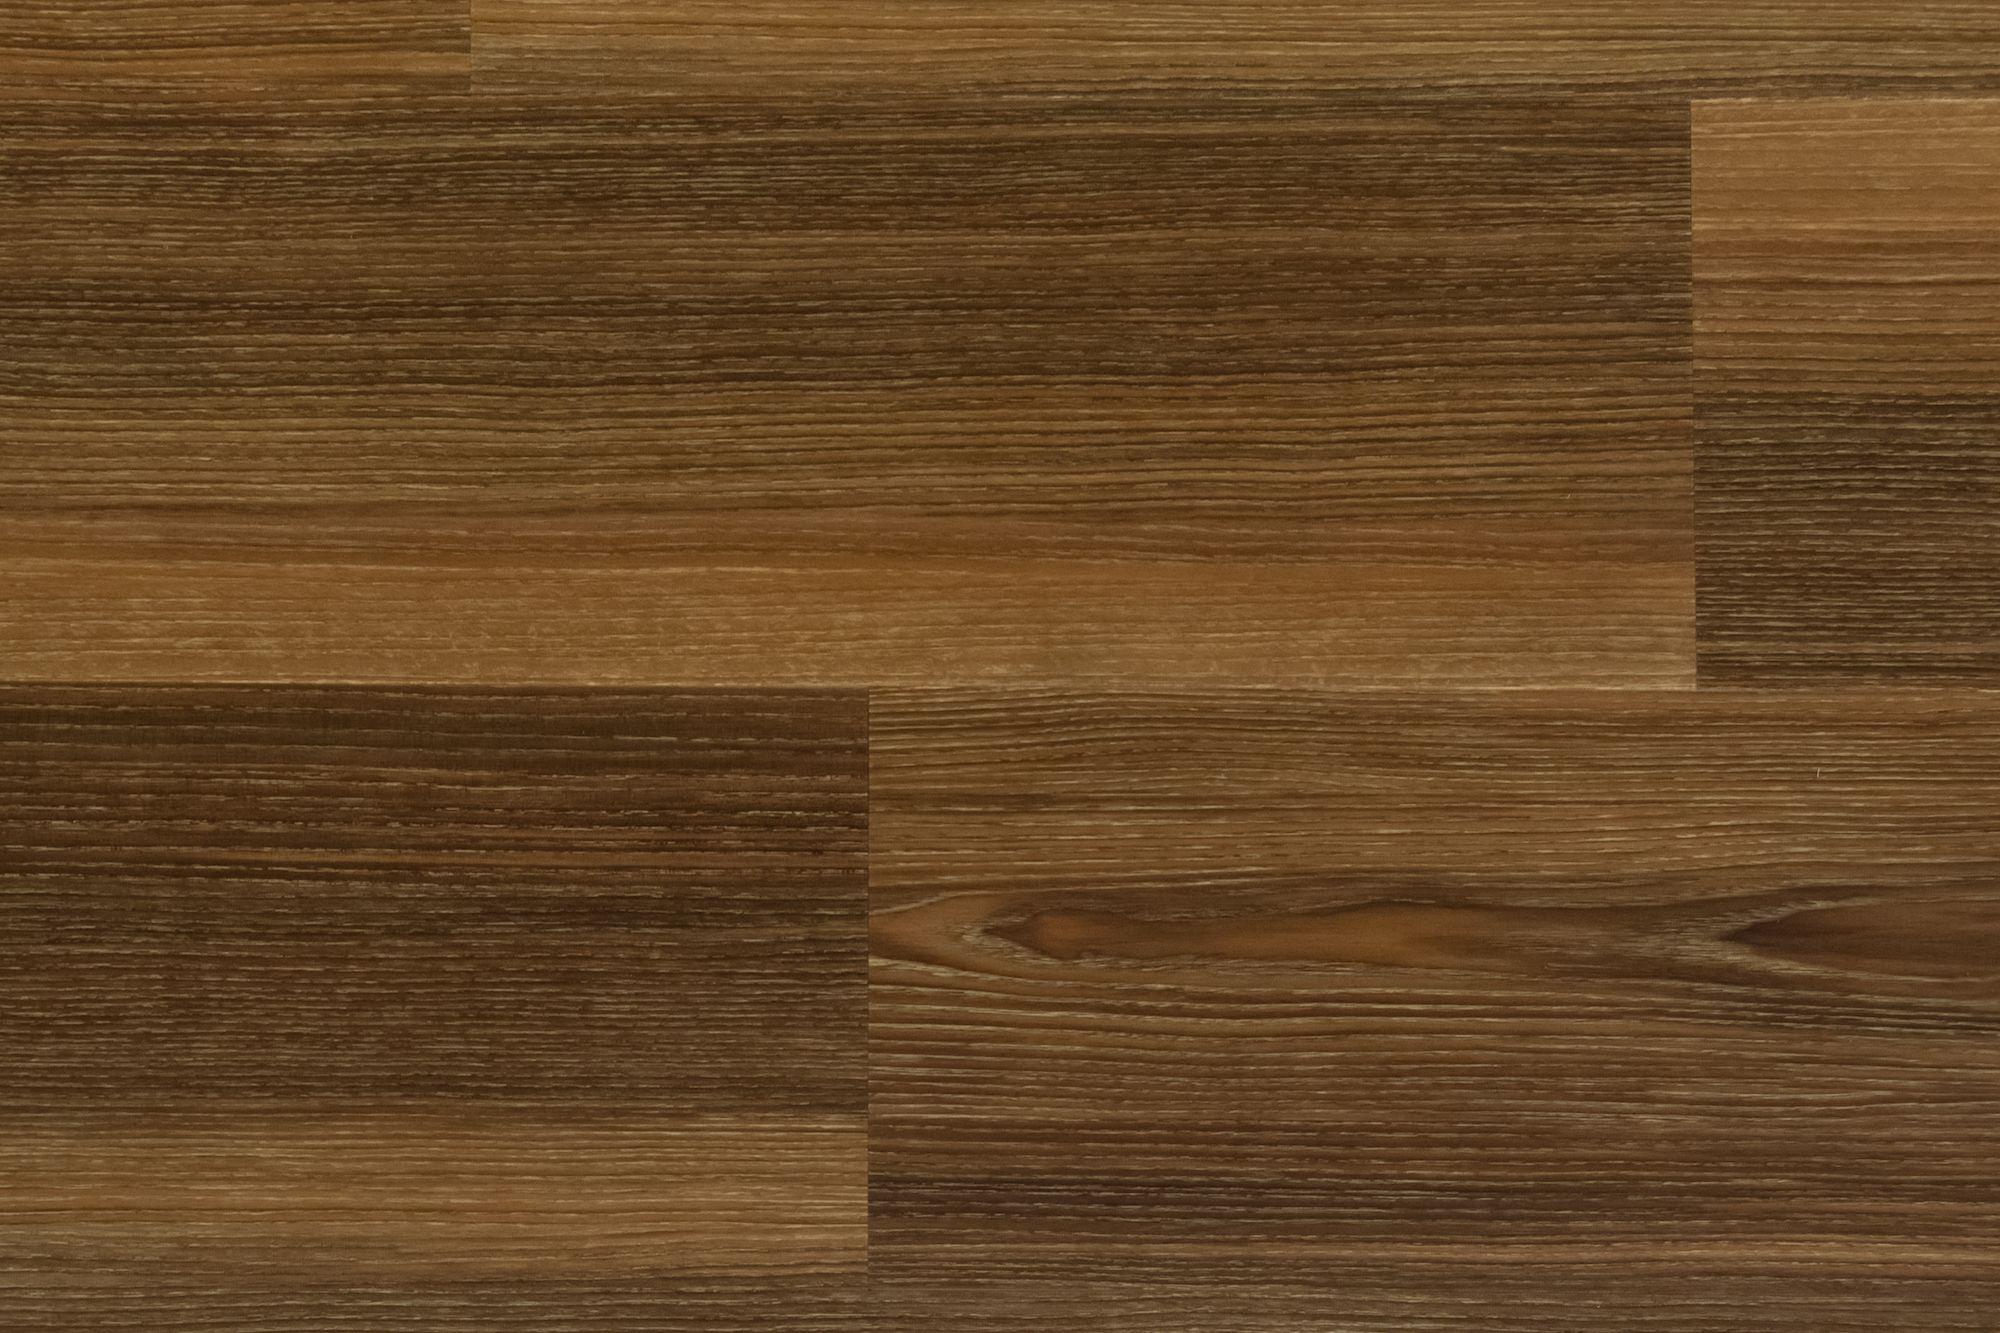 Timber Lvt Flooring Collection Luxury Vinyl Tile Timber Flooring